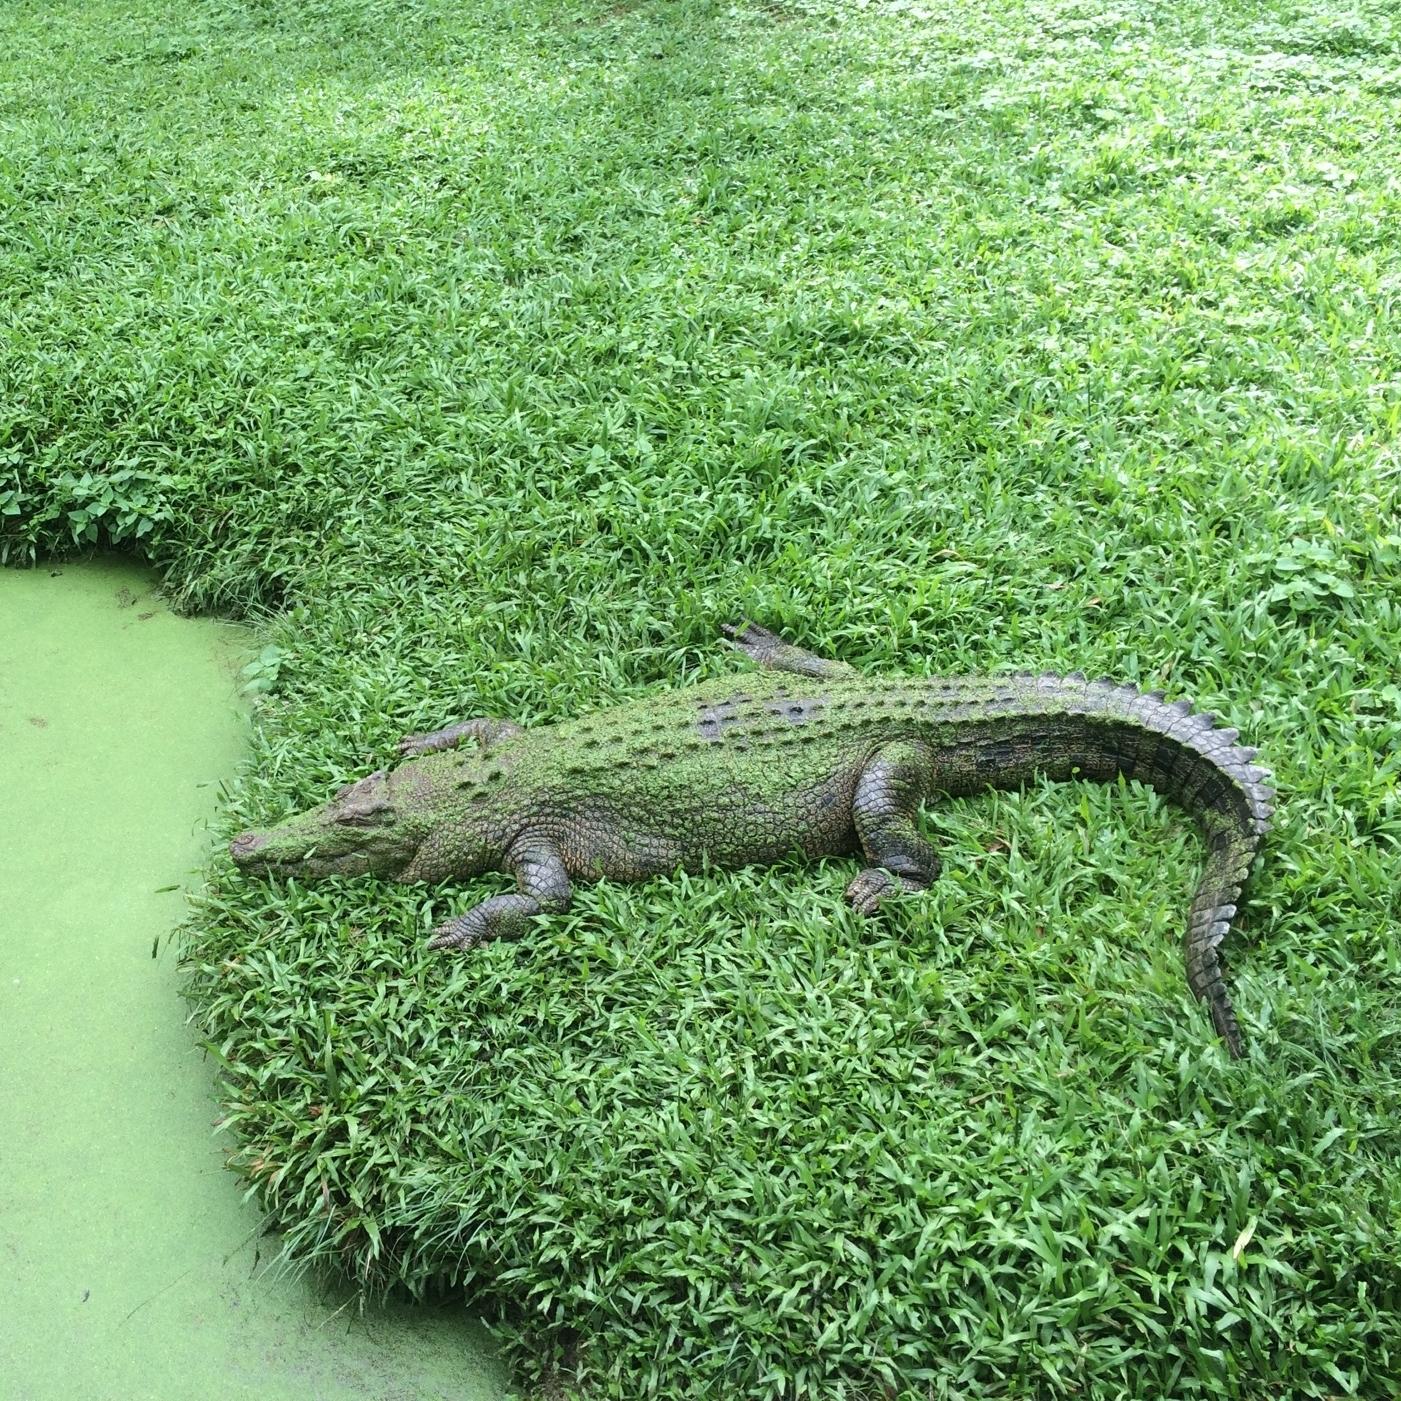 Crocodile, David Fleay Wildlife Park, Surfer's Paradise by Miles Dean for The Doubtful Traveller